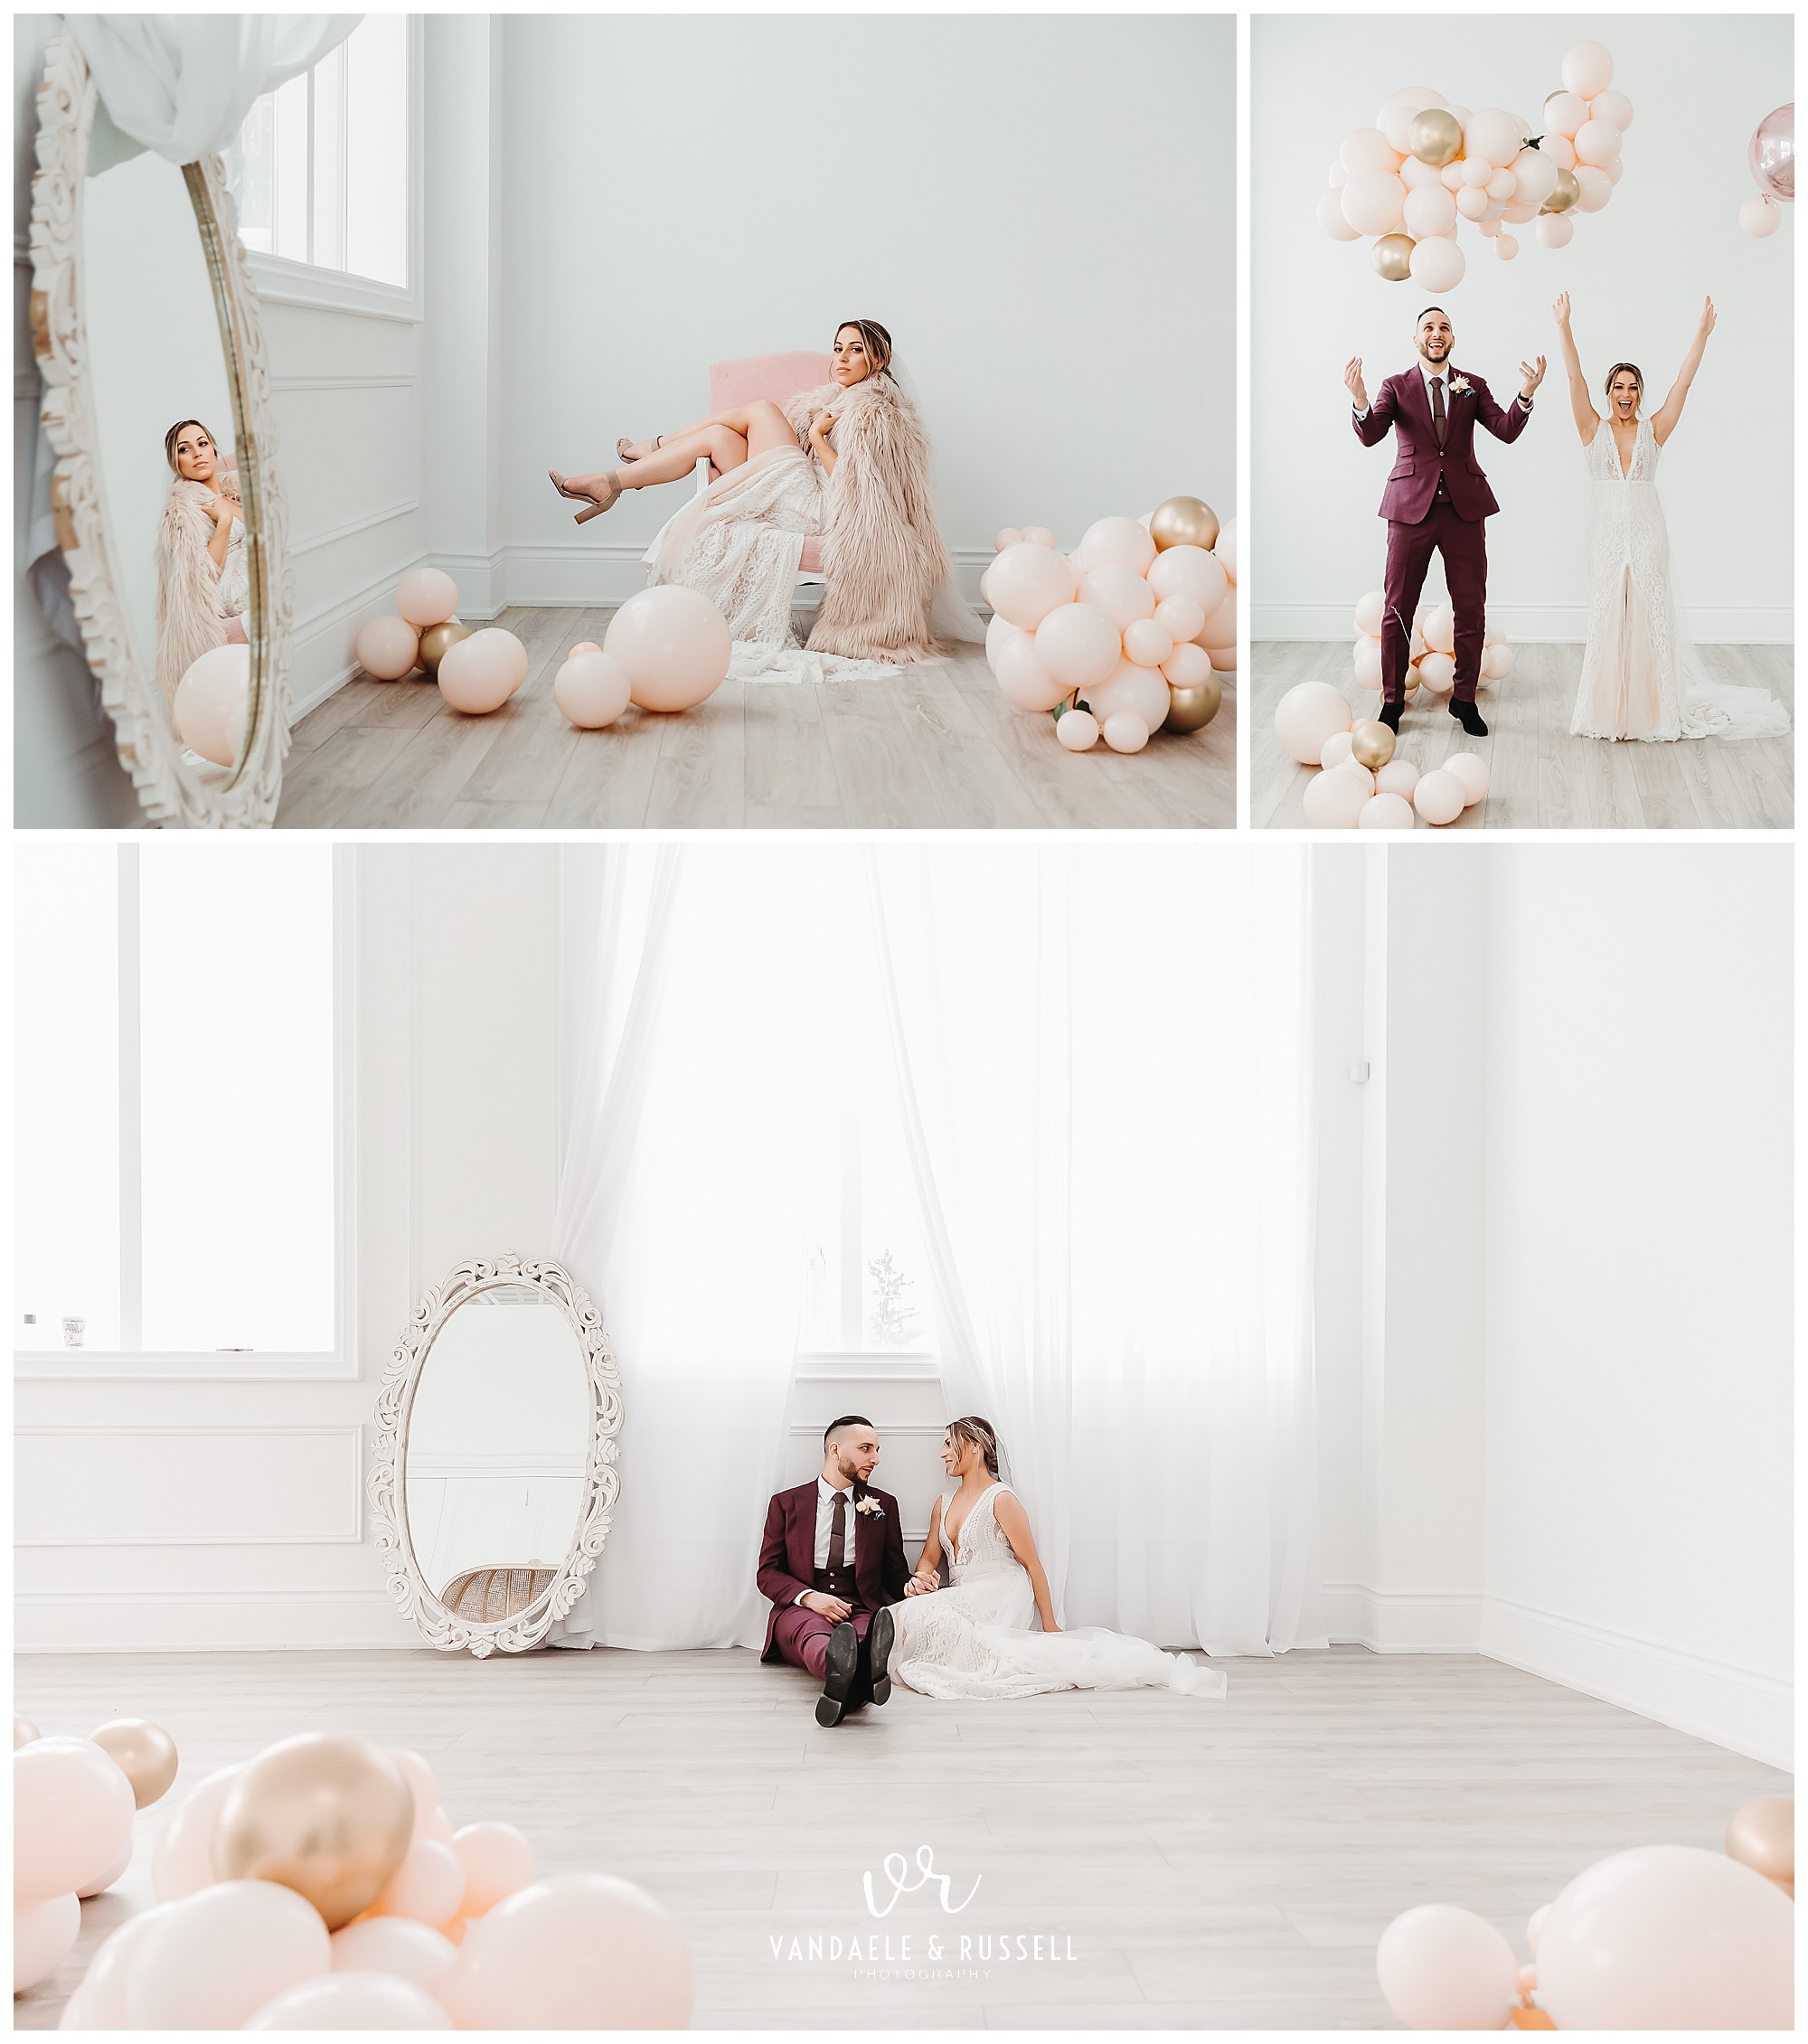 Joanna-Christos-Grand-Luxe-Wedding-Photos-Mint-Room-Toronto-VanDaele-Russell_0090.jpg